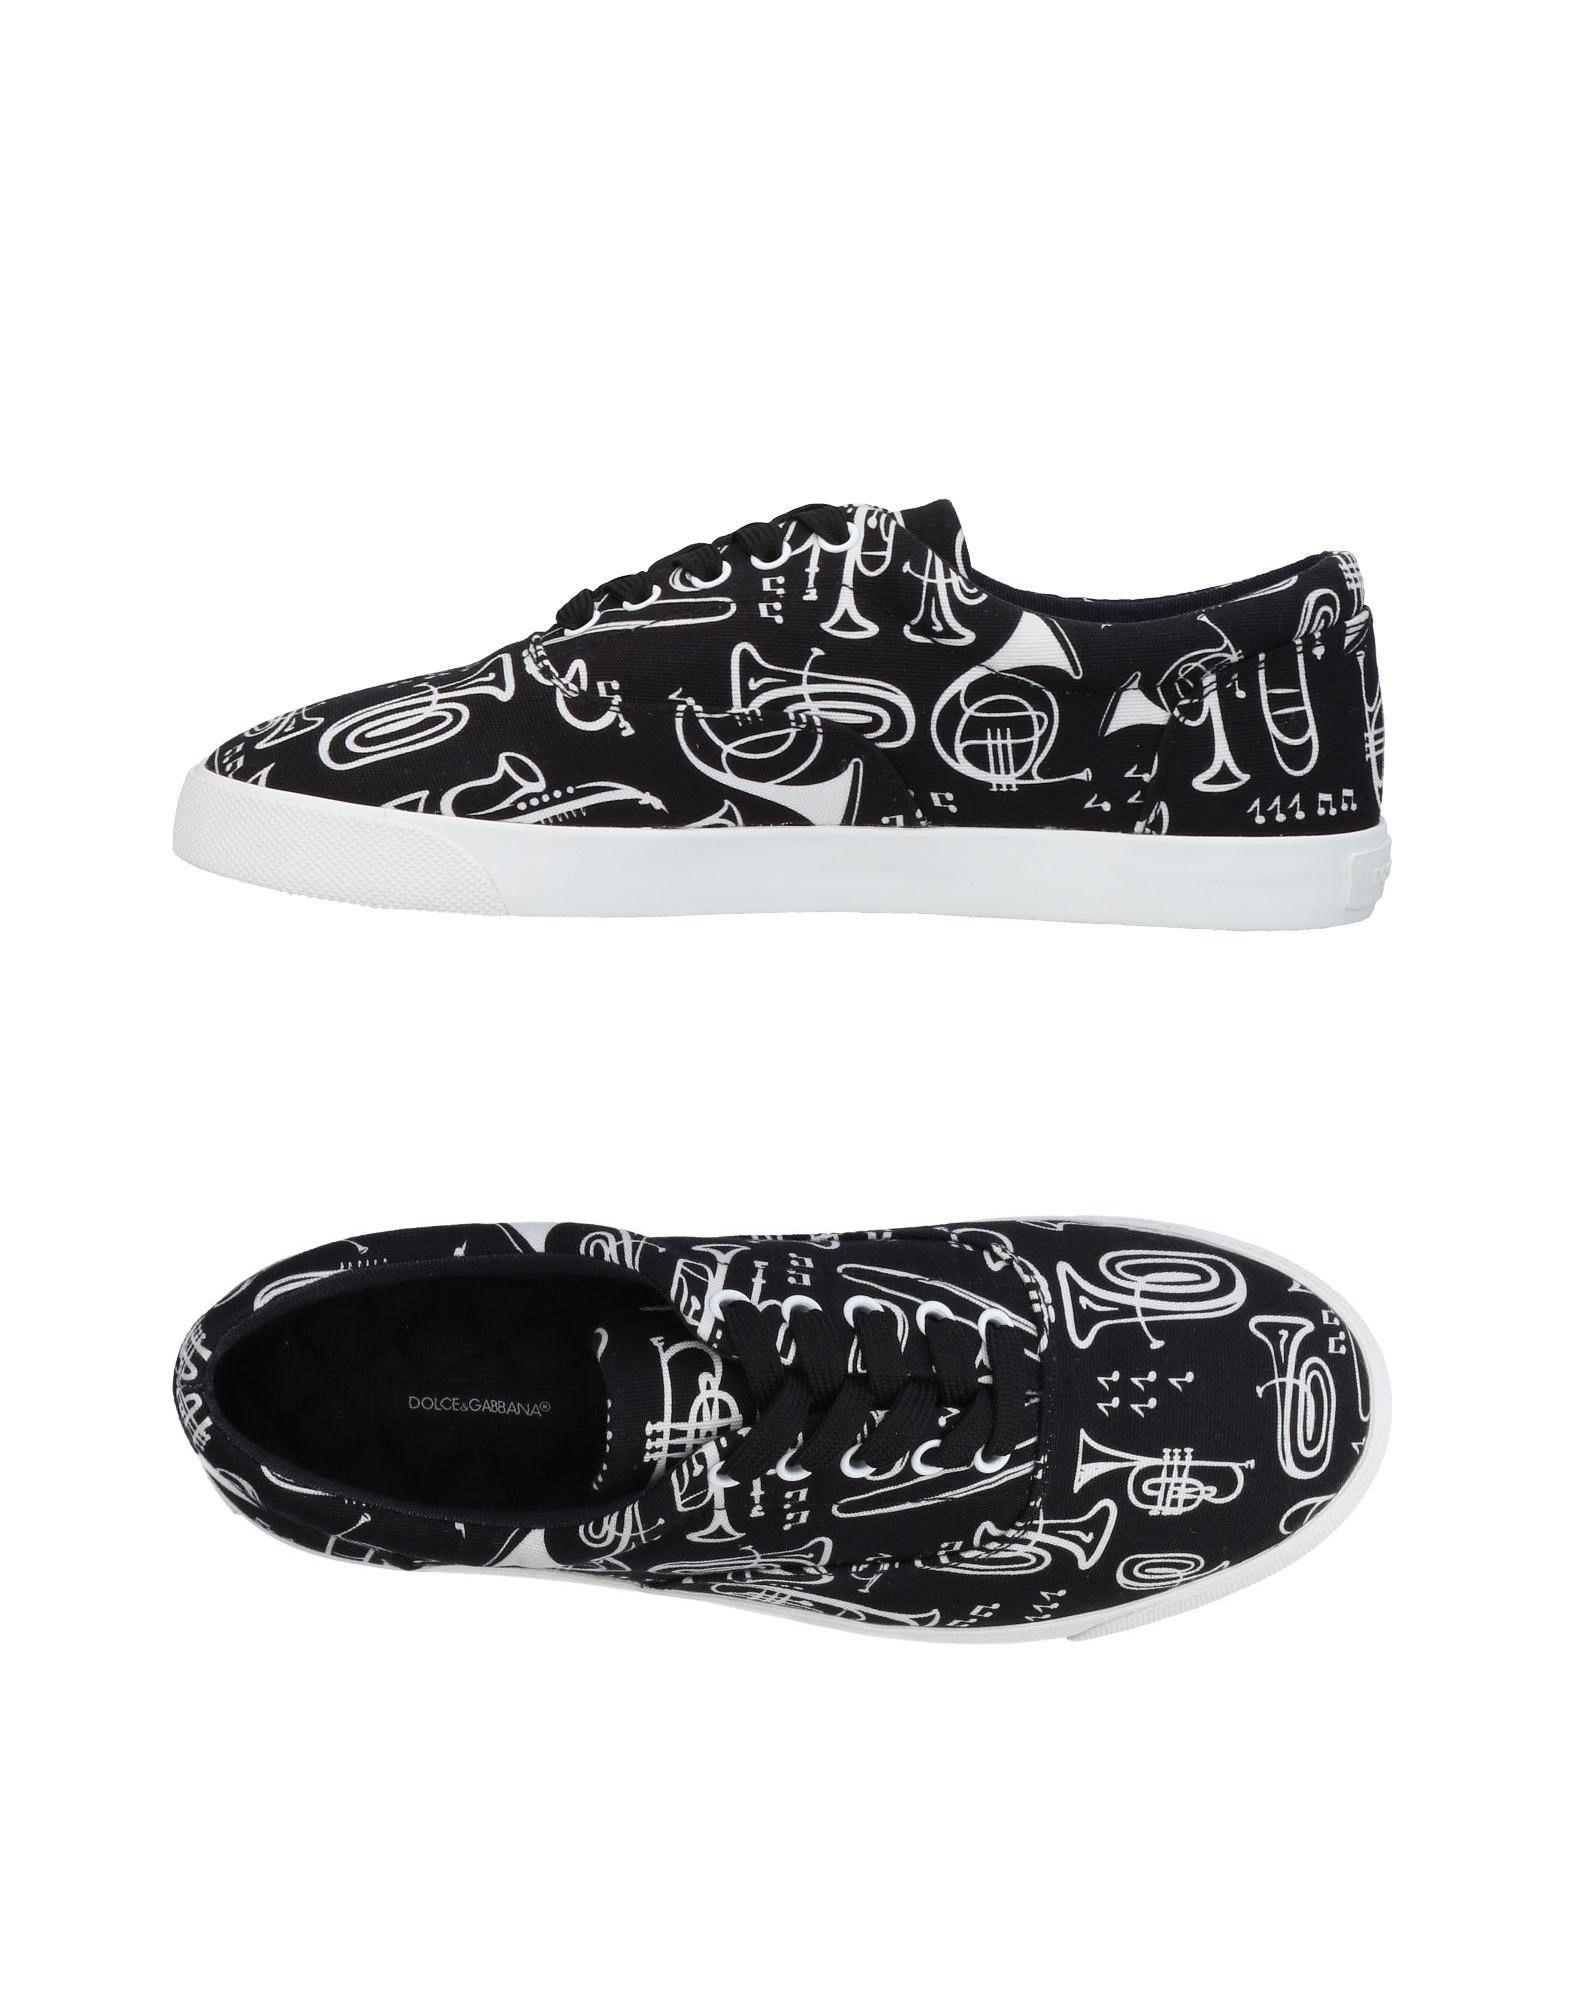 Dolce & Gabbana Sneakers Herren  11453551CK Gute Qualität beliebte Schuhe